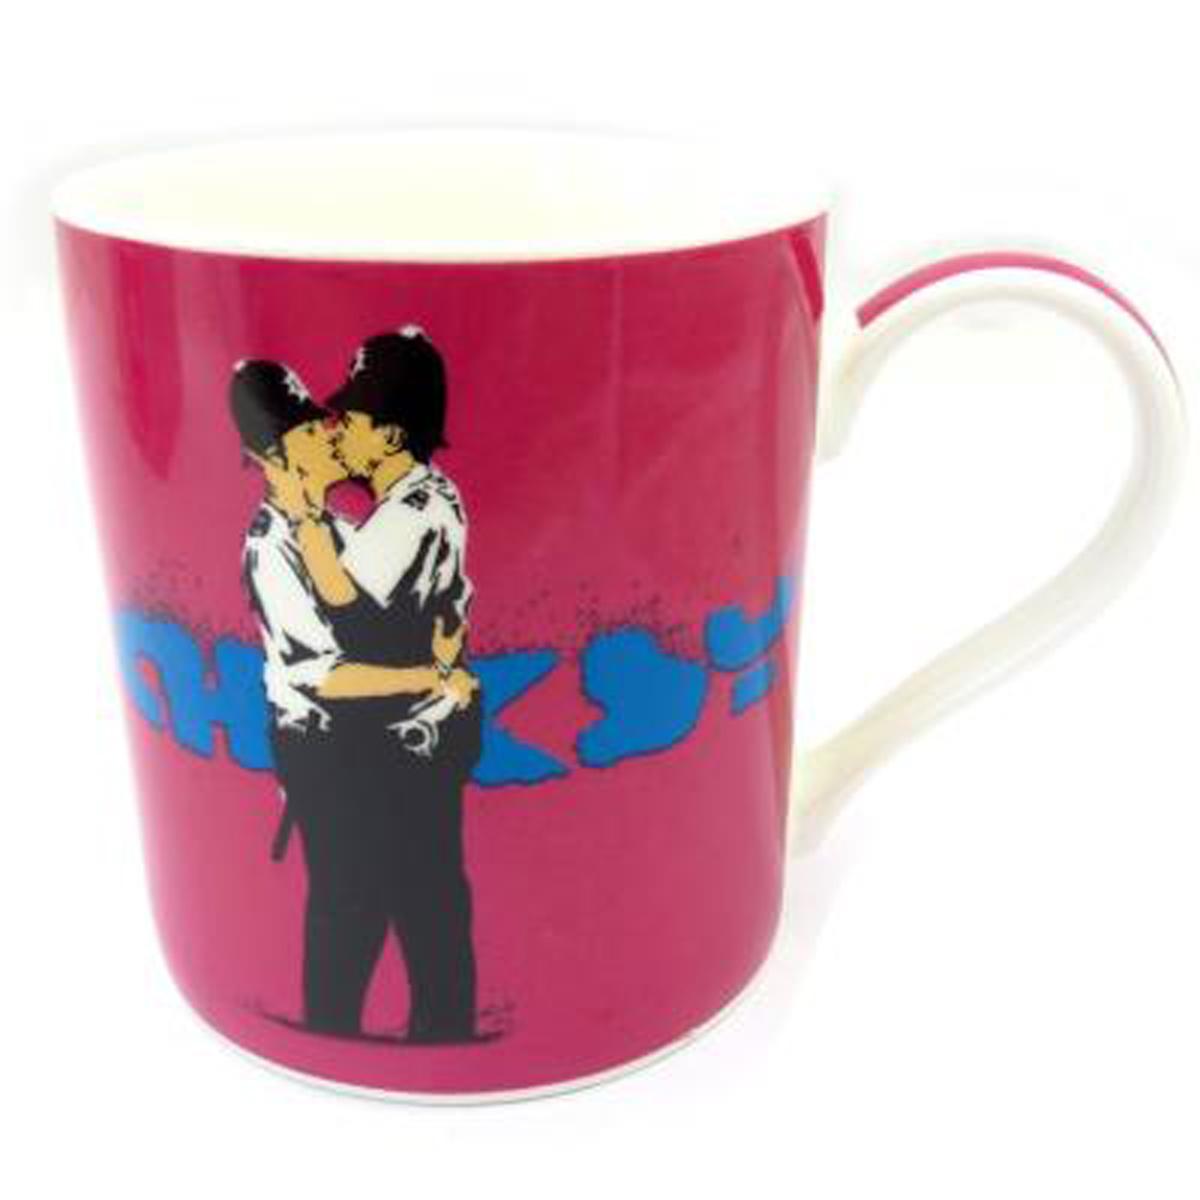 Mug porcelaine \'Banksy\' rose (kissing London cops) - 90x85 mm - [Q8814]